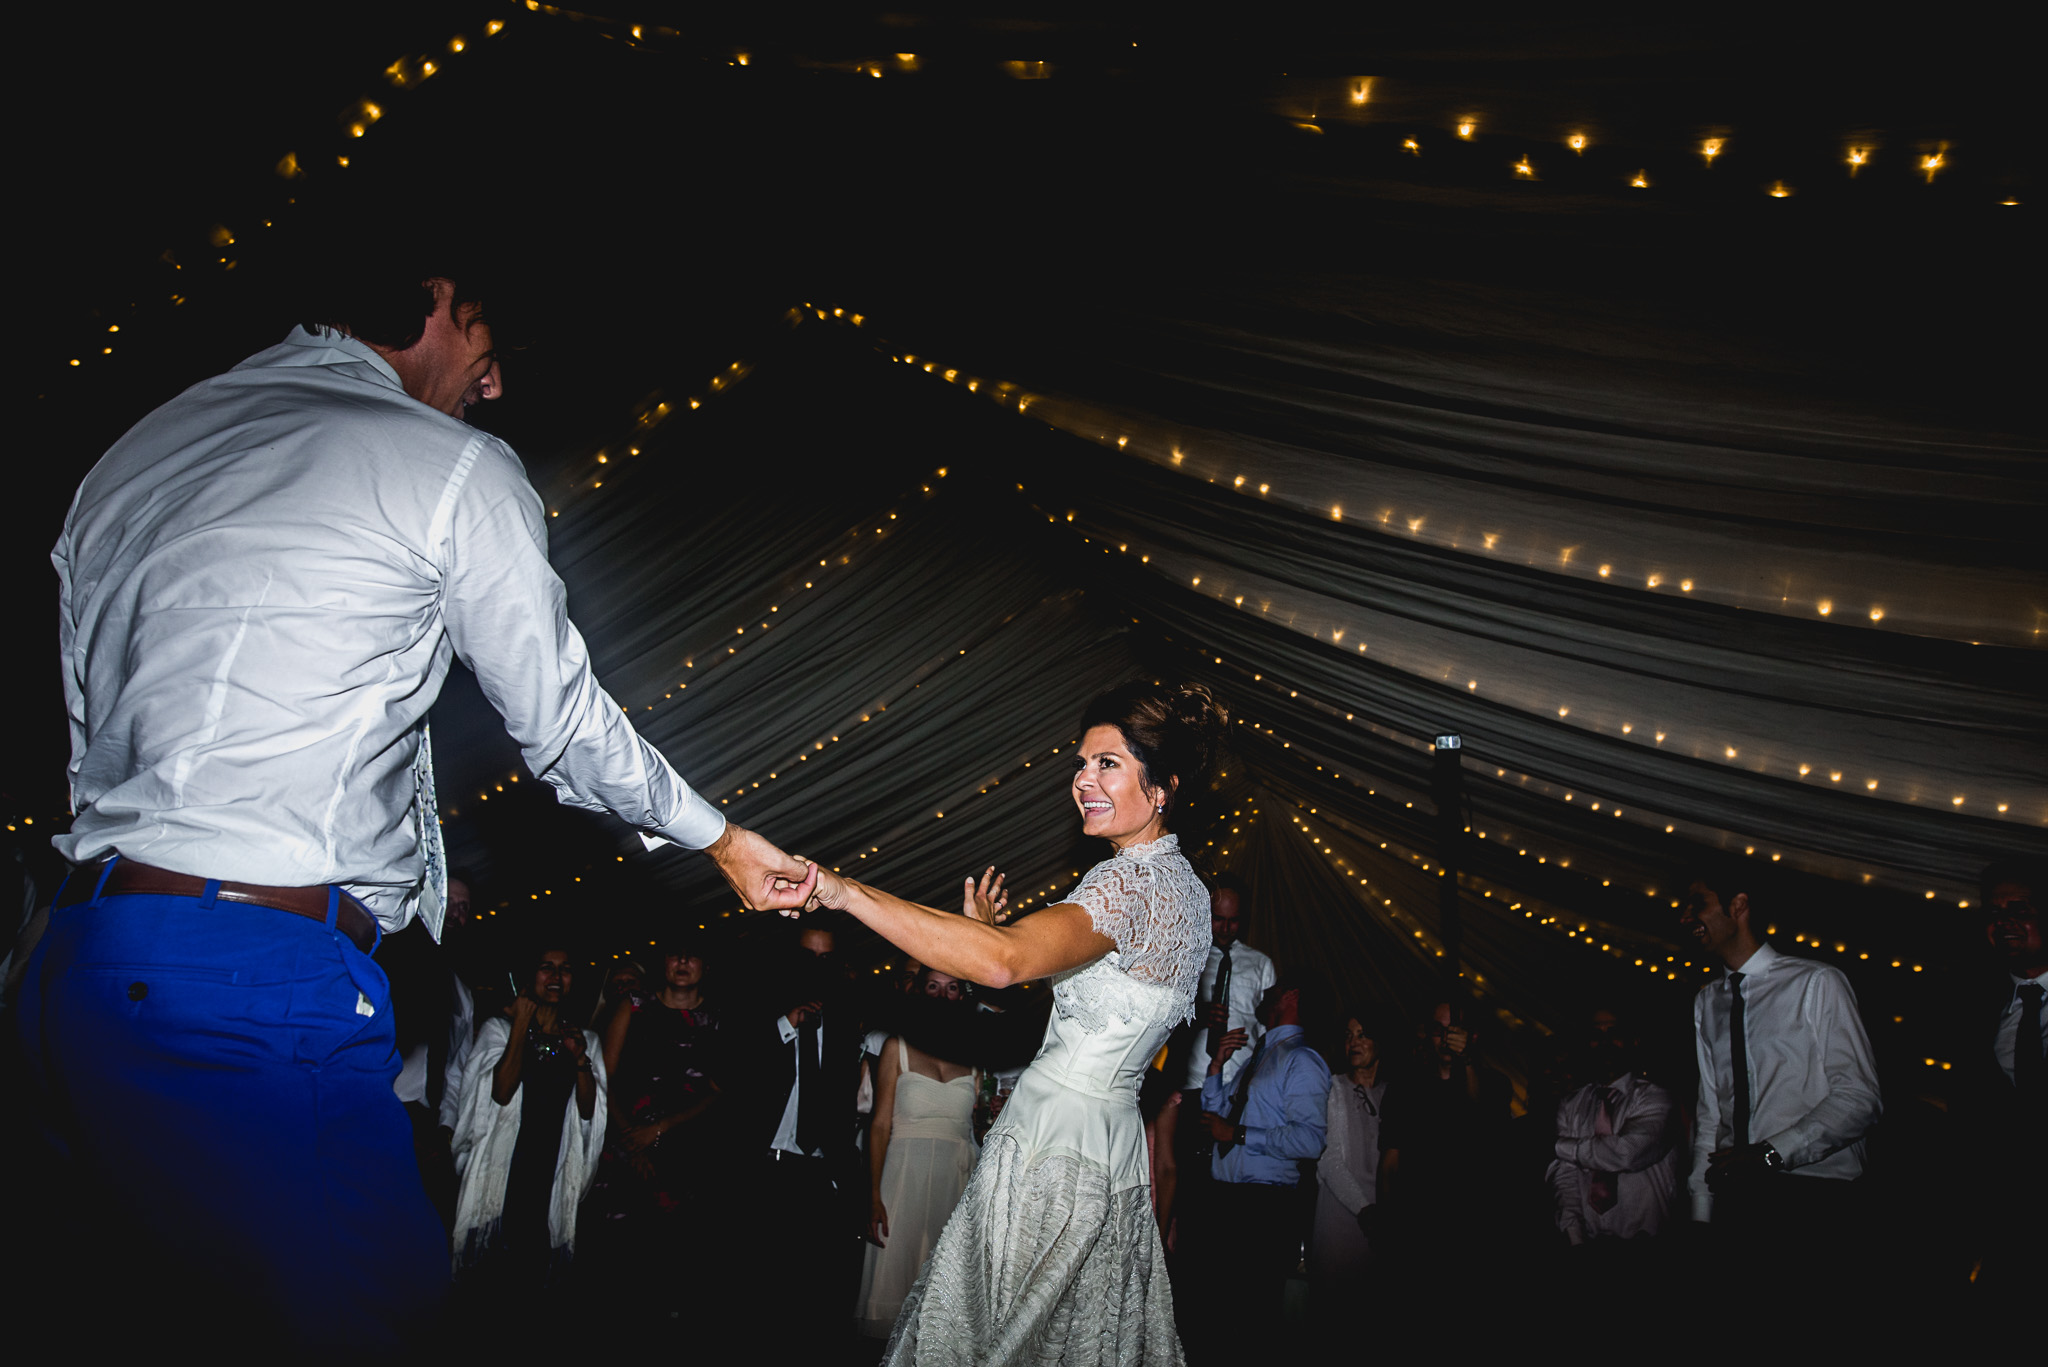 Lara & Jack Wedding 220815 by Barney Walters_1063_BW2_1099